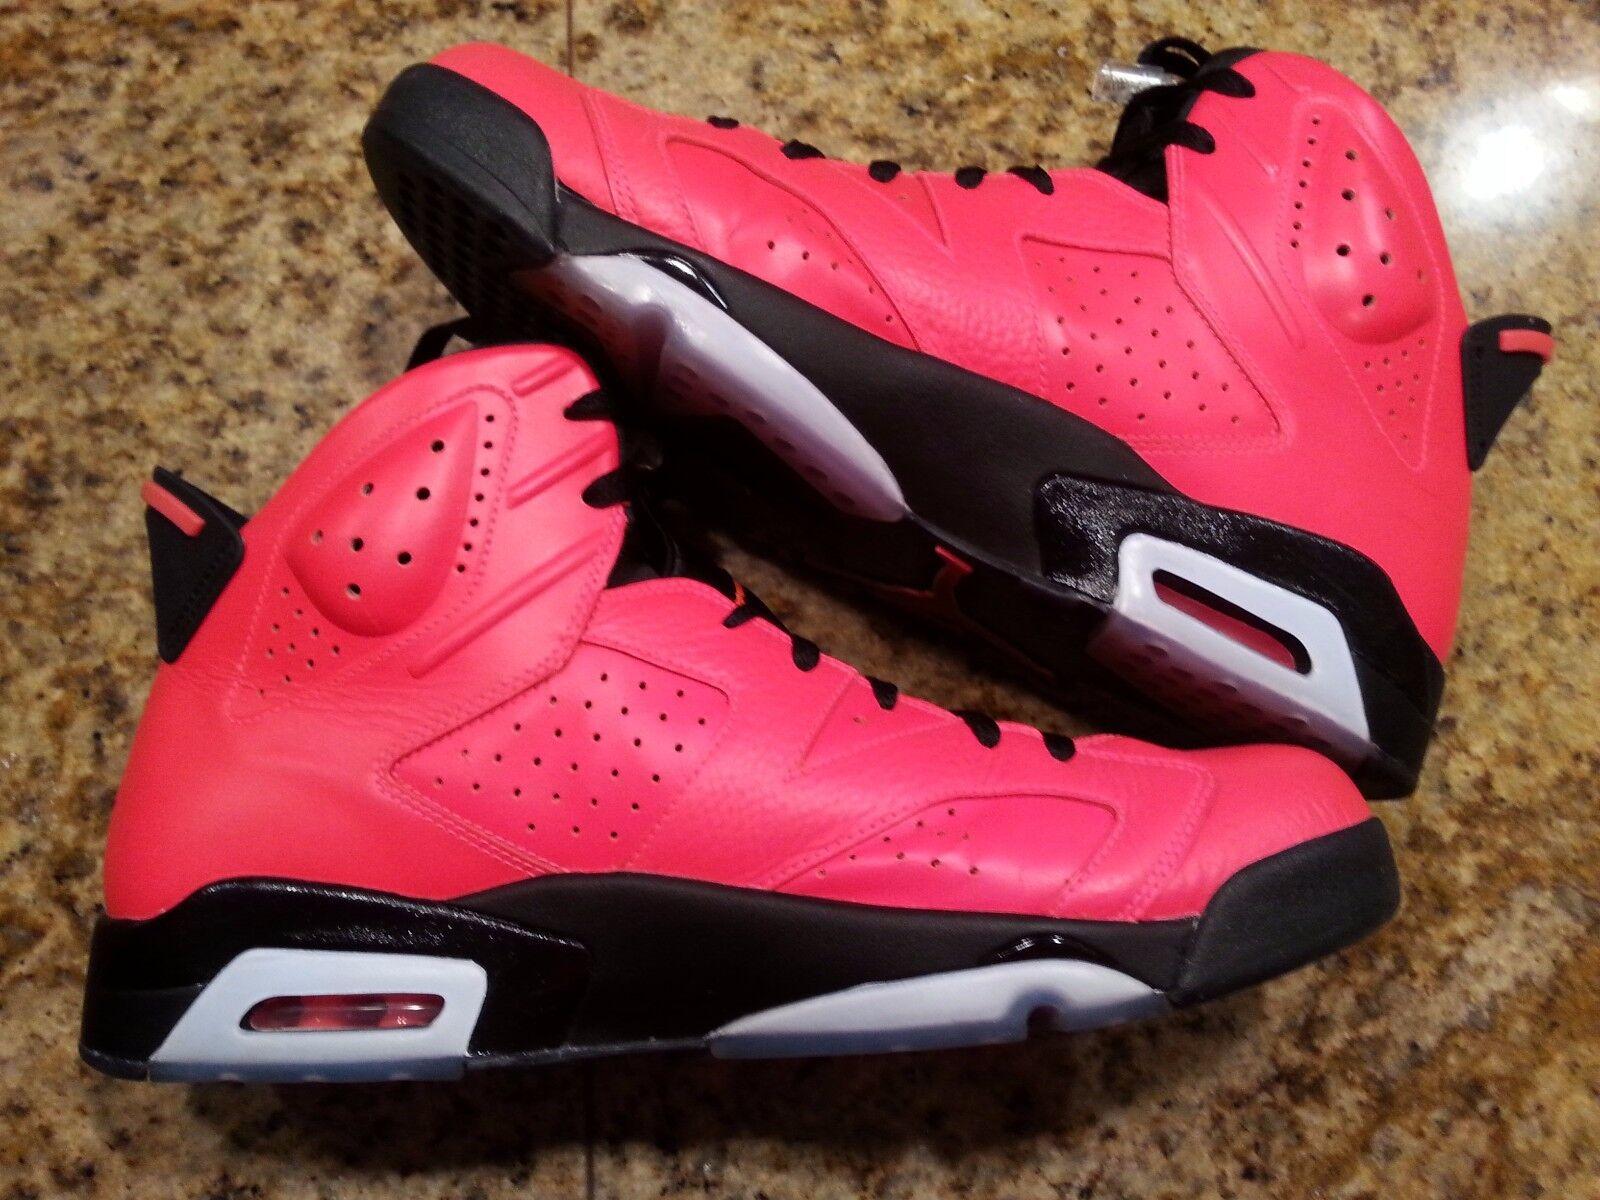 7554b5913302f6 2014 Nike Air Jordan 6 VI Retro Infrared 23 23 23 Size 14. 384664 ...